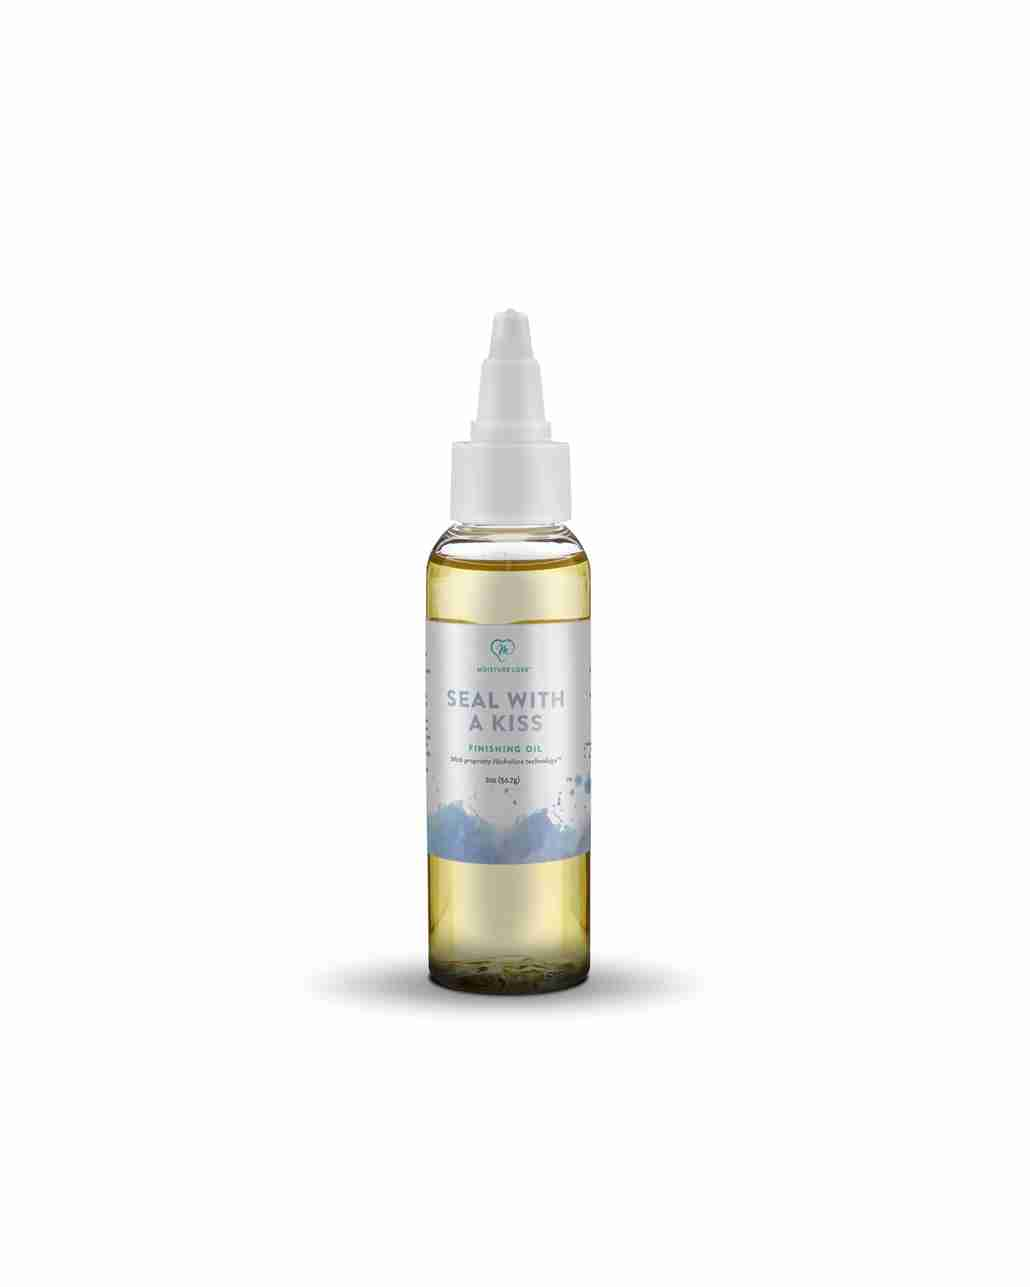 moisturizing styling creams